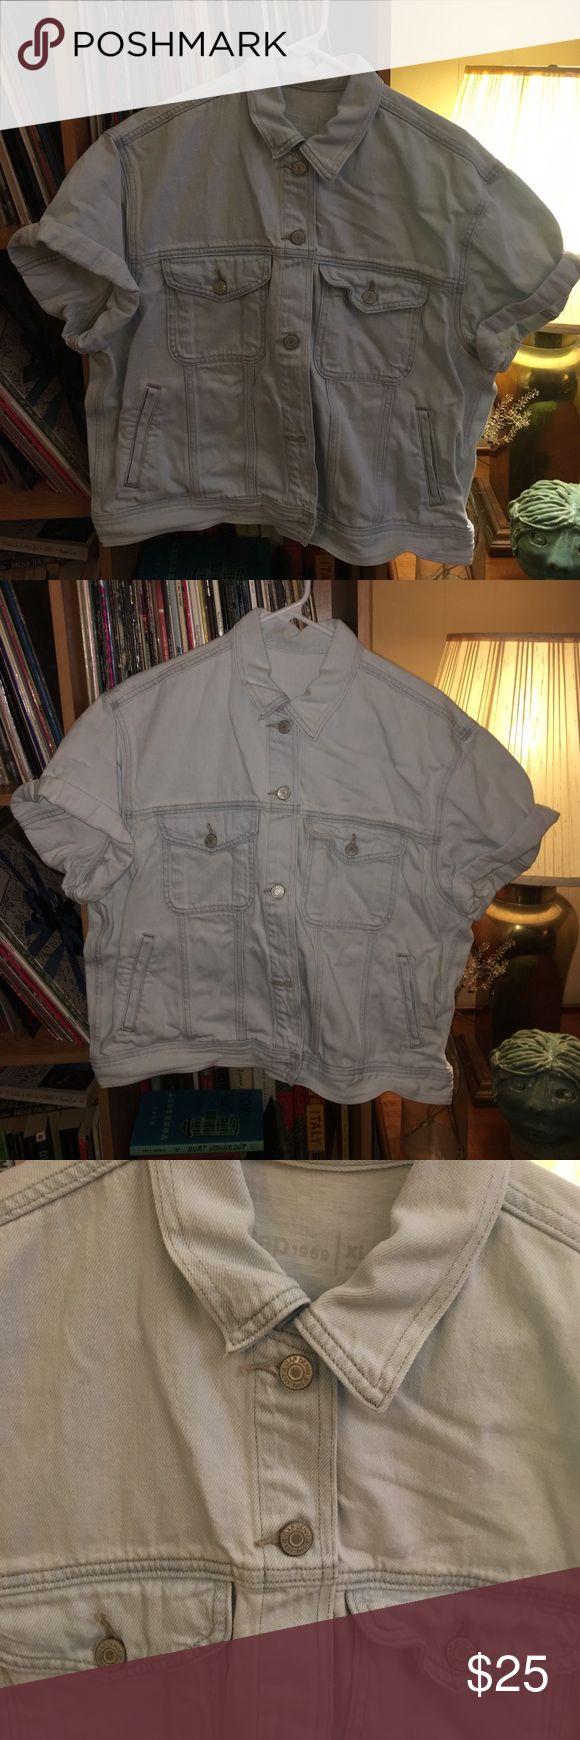 Gap Denim Short Sleeved Jean Jacket Very light wash Gap 1969 Denim. Great condition! GAP Jackets & Coats